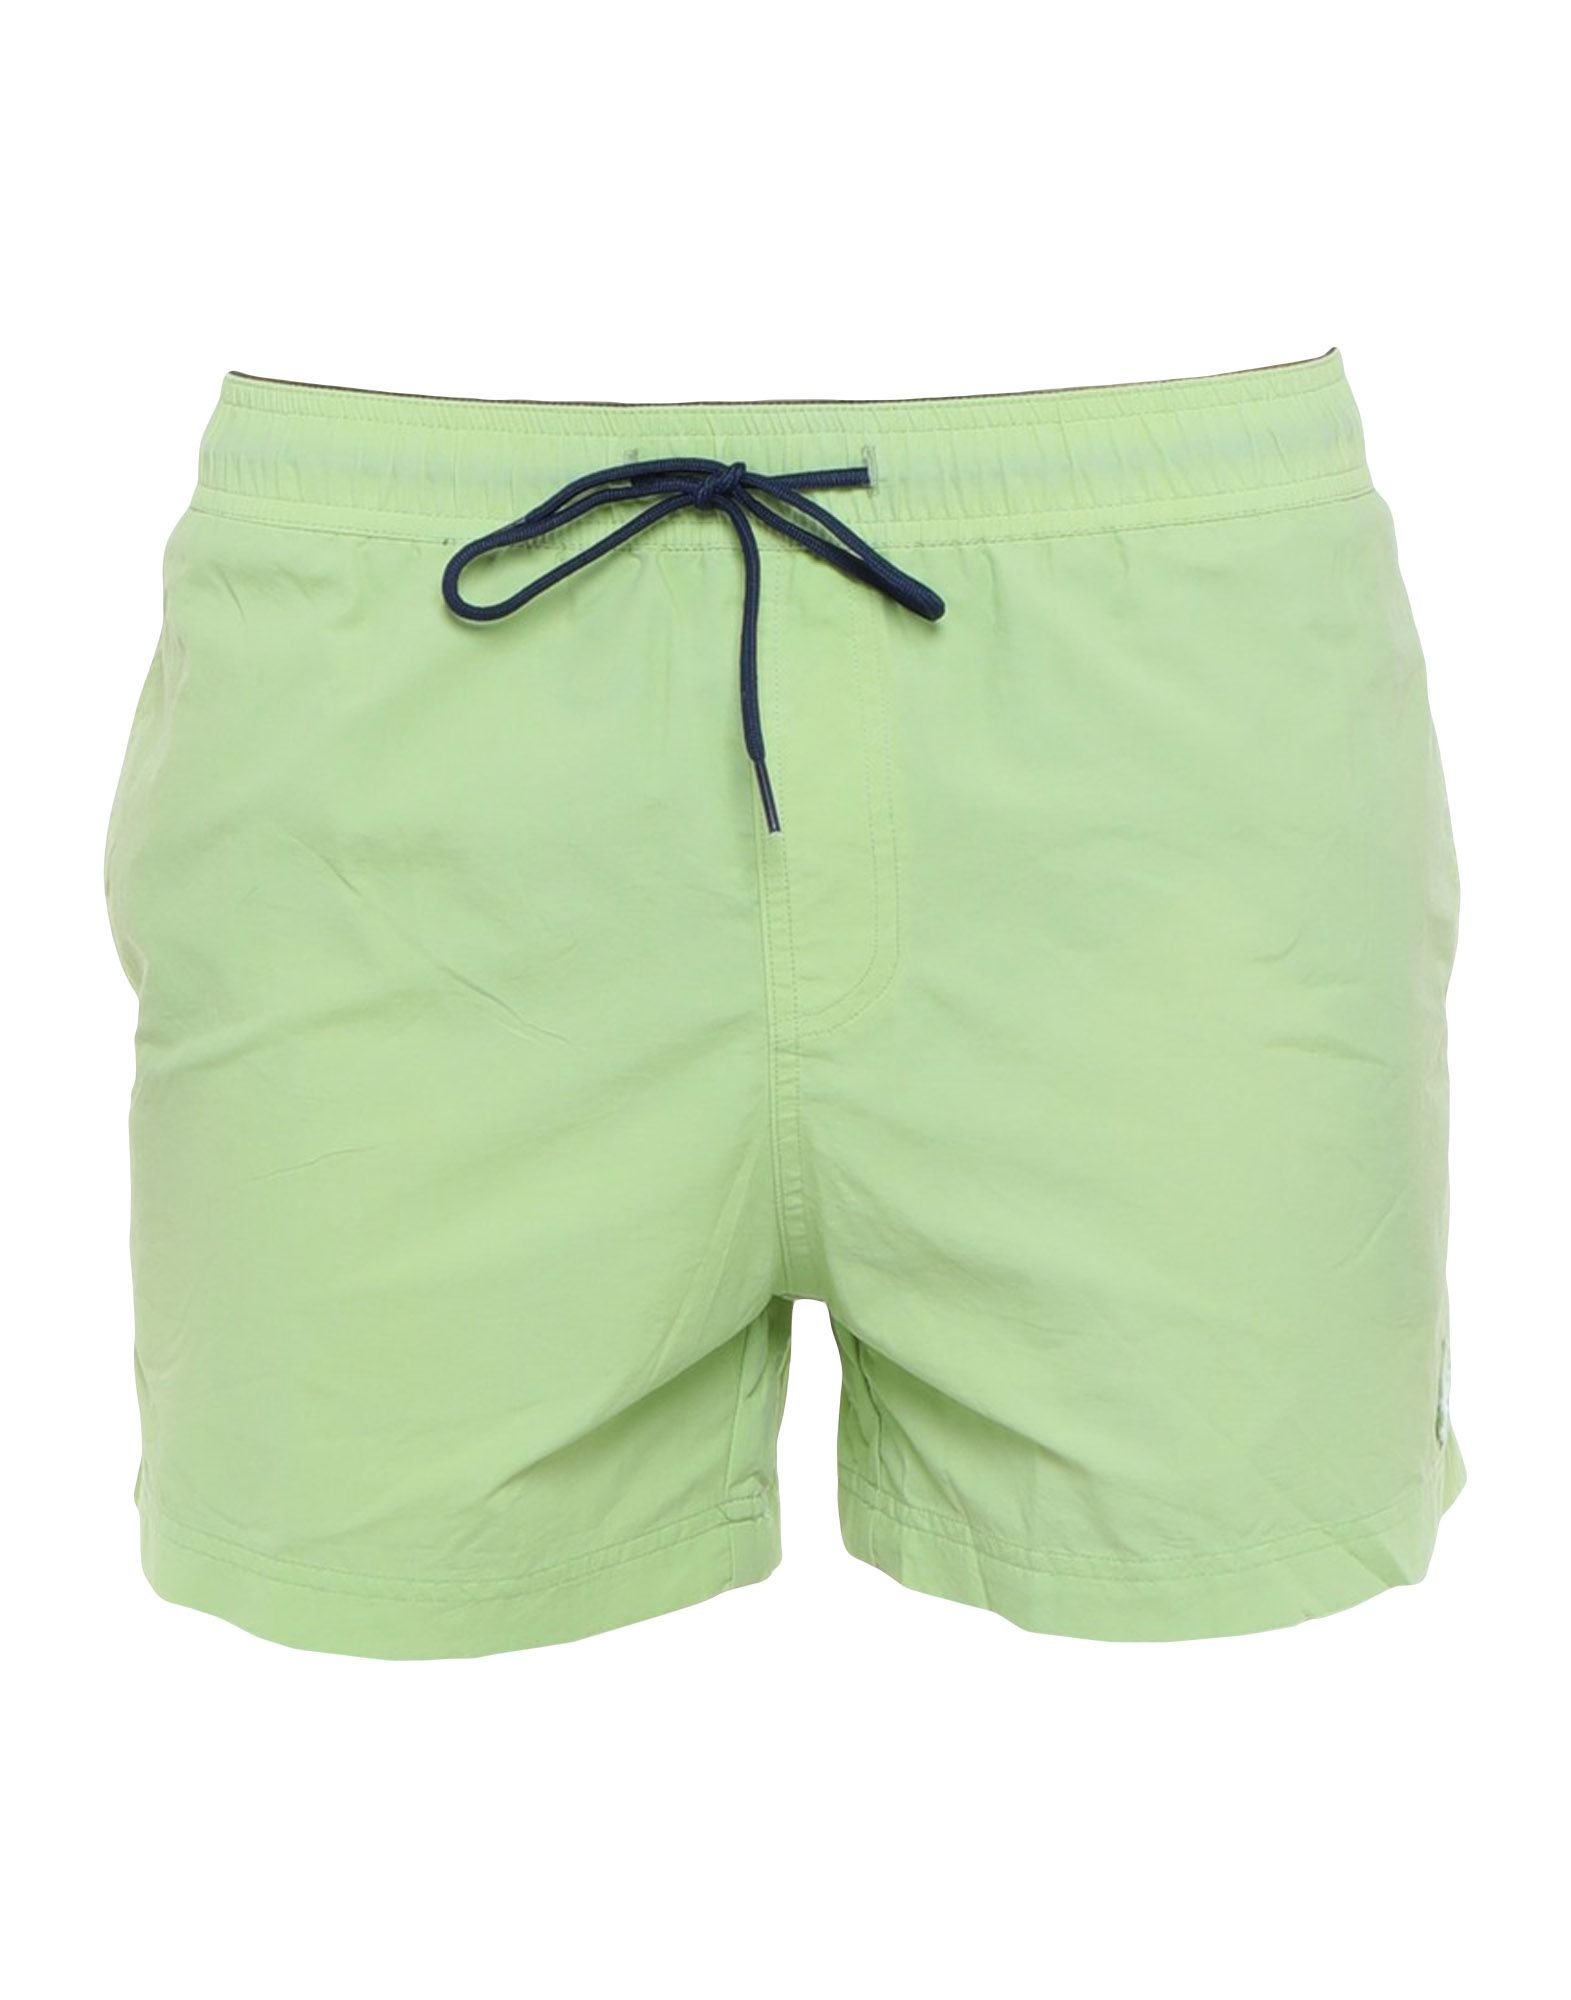 fa788d09d8 Beverly Hills Polo Club Swim Shorts - Men Beverly Hills Polo Club ...